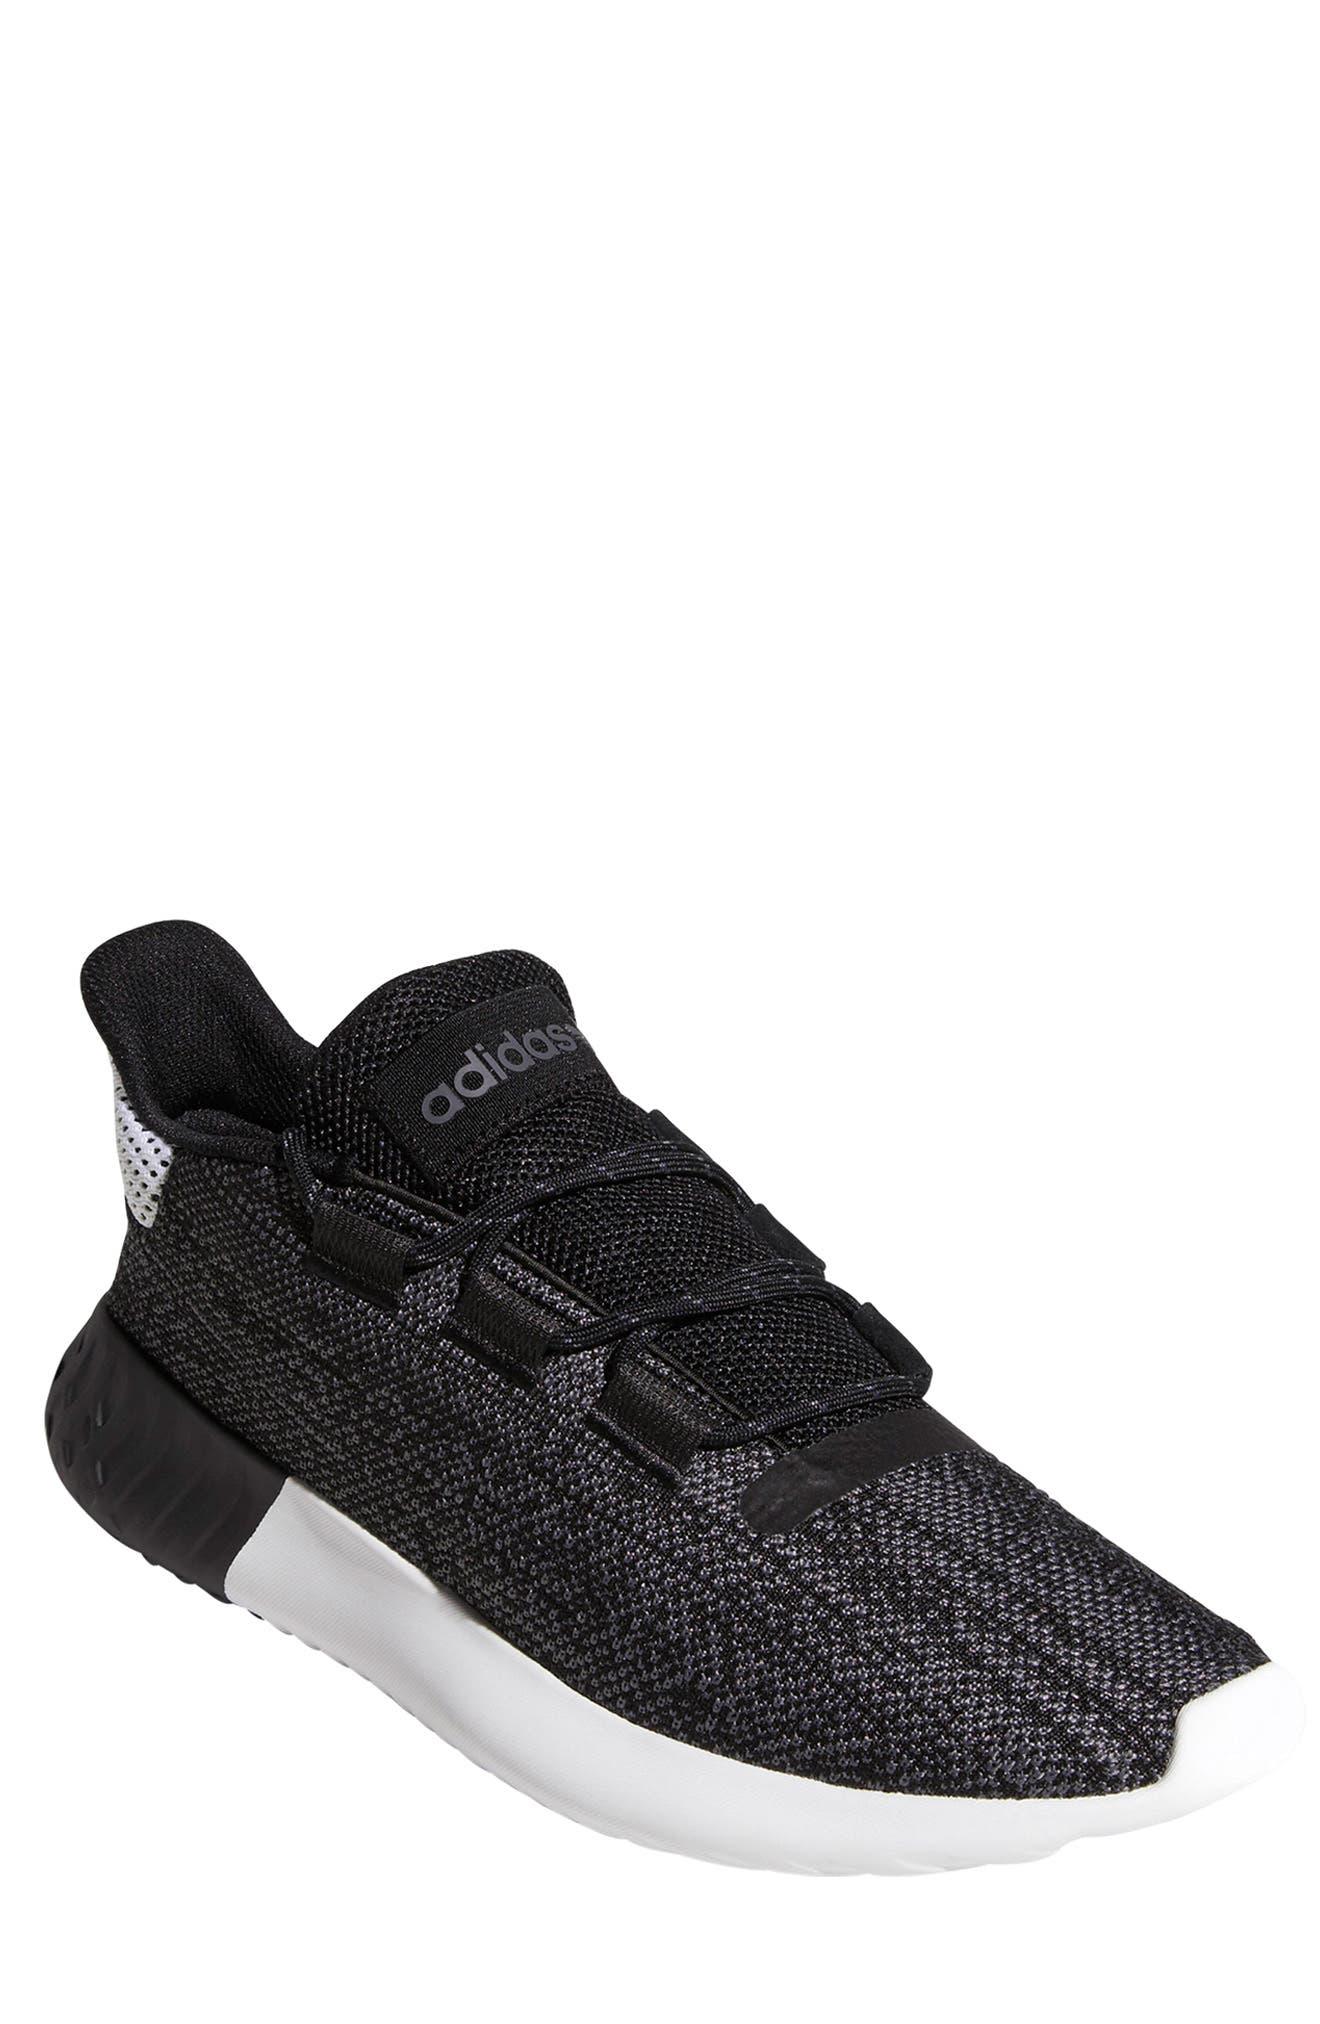 Tubular Dusk Primeknit Sneaker,                         Main,                         color, WHITE/ BLACK/ GREY